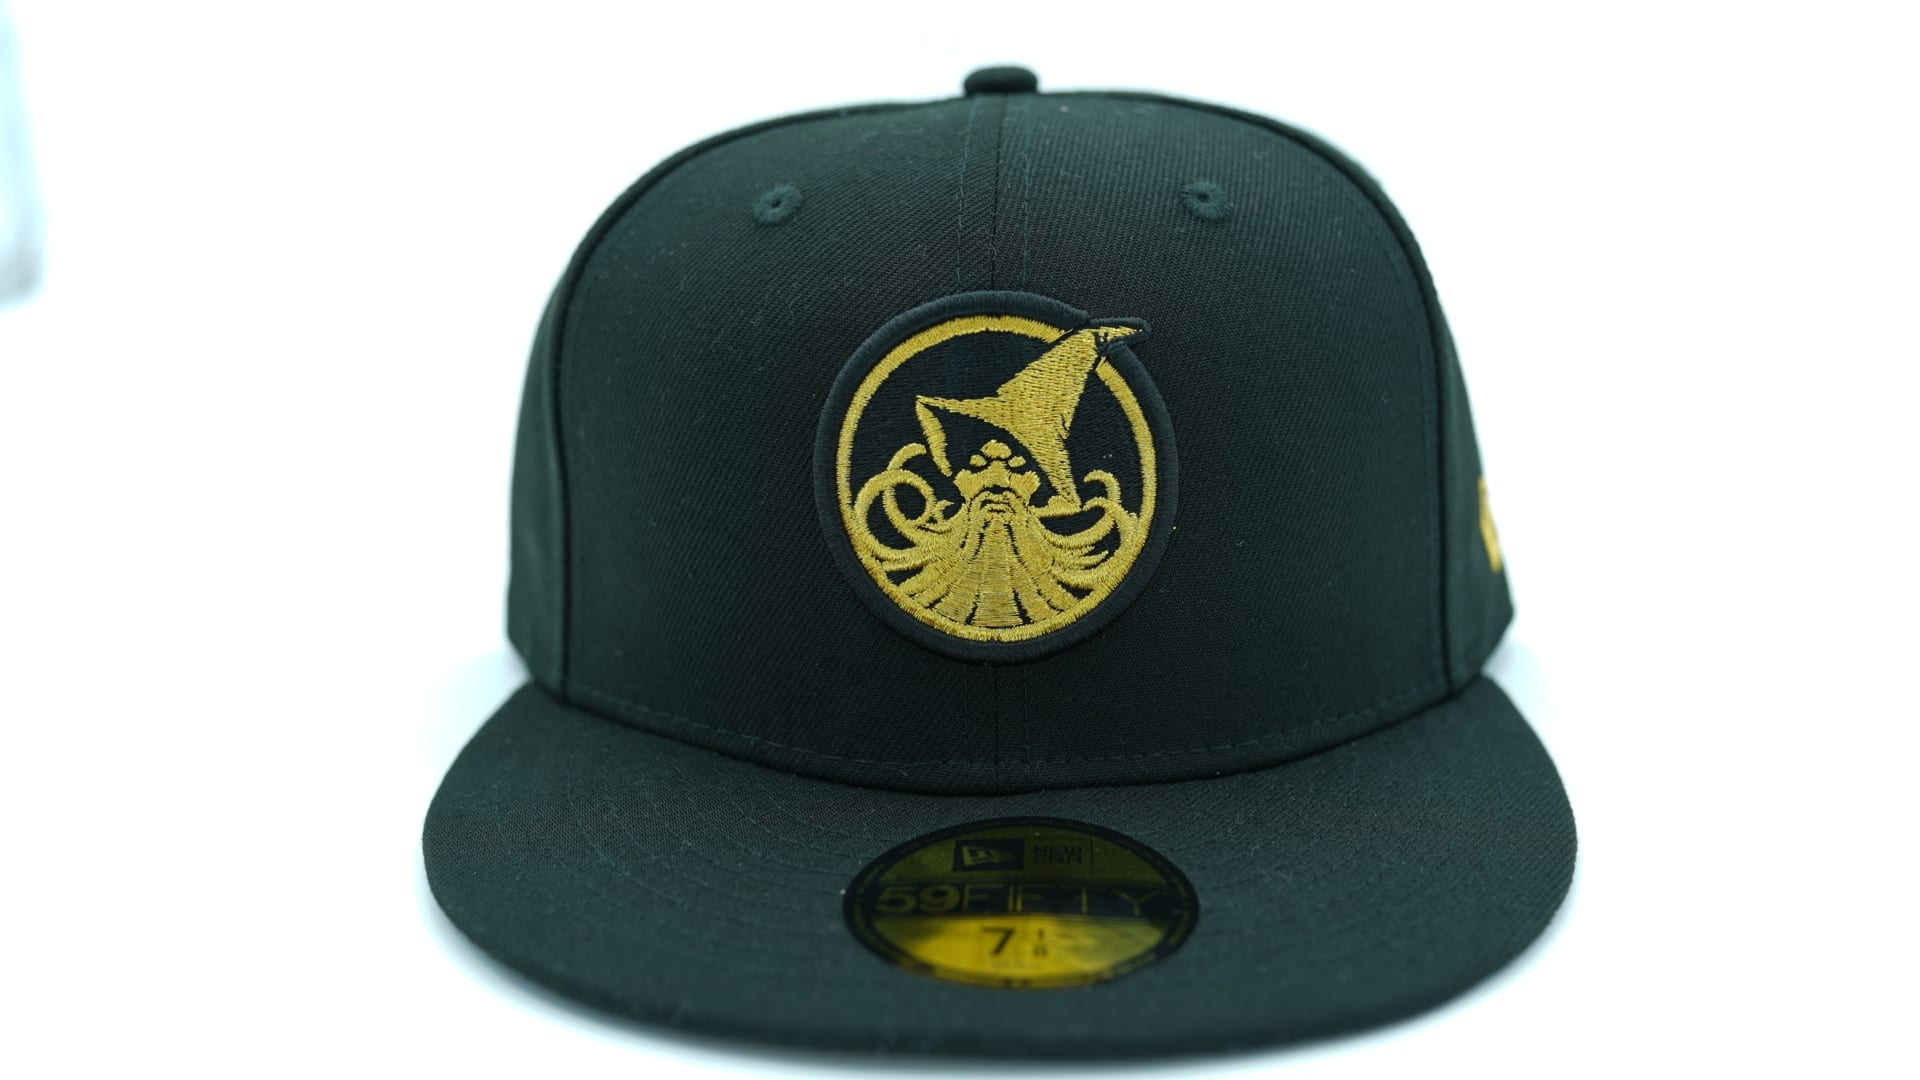 504abede39d99 ... 50% off online retailer 29f8d 352cd new era 59fifty fitted baseball cap  82418 6ec6a